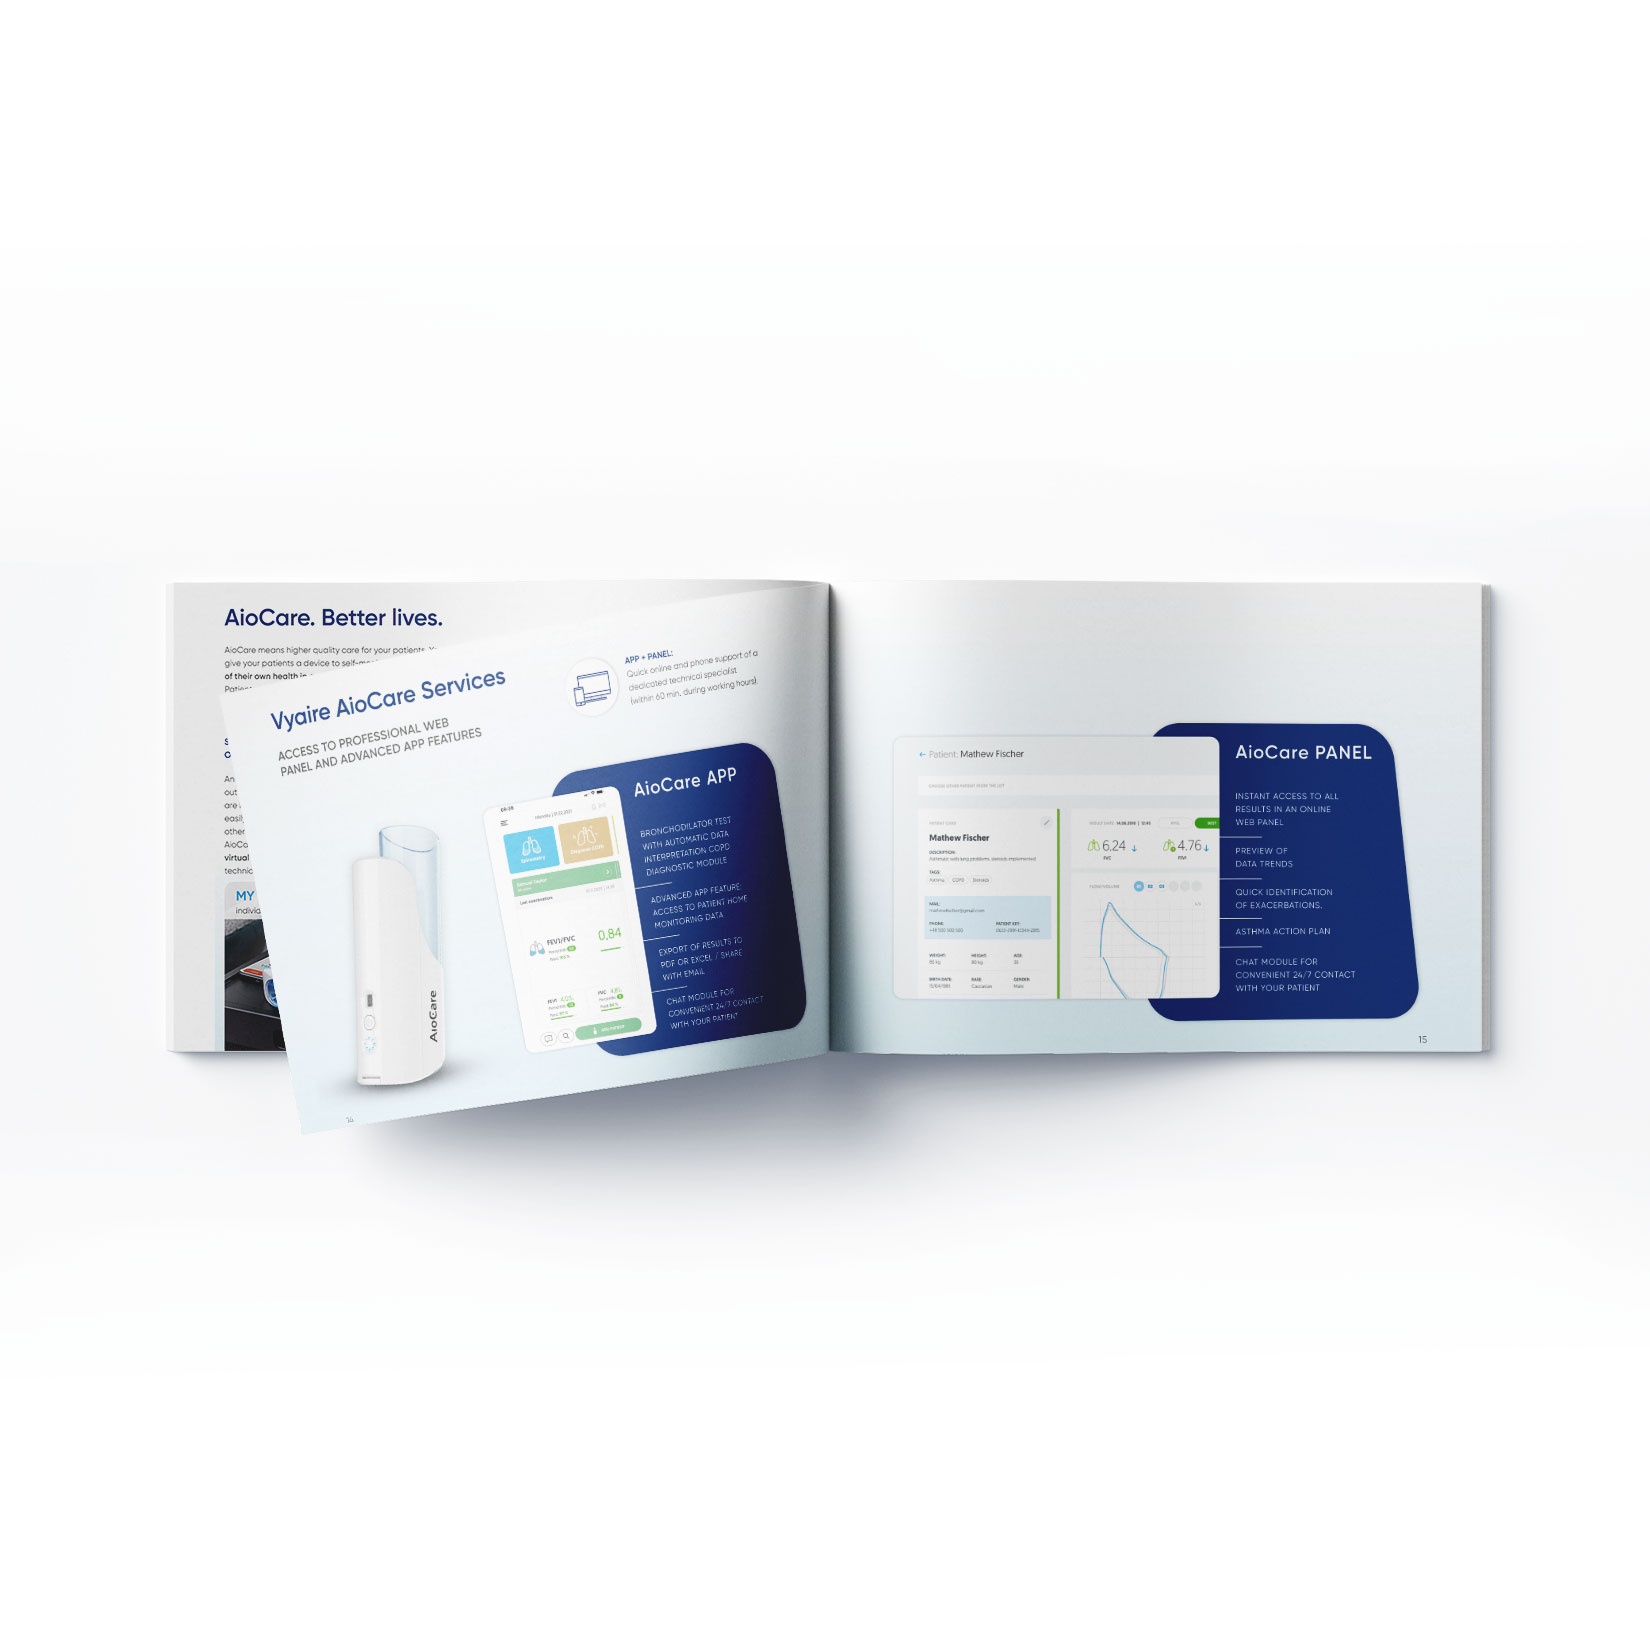 doppelseitige Broschüre für Vyaire Medical AioCare Produktlaunch